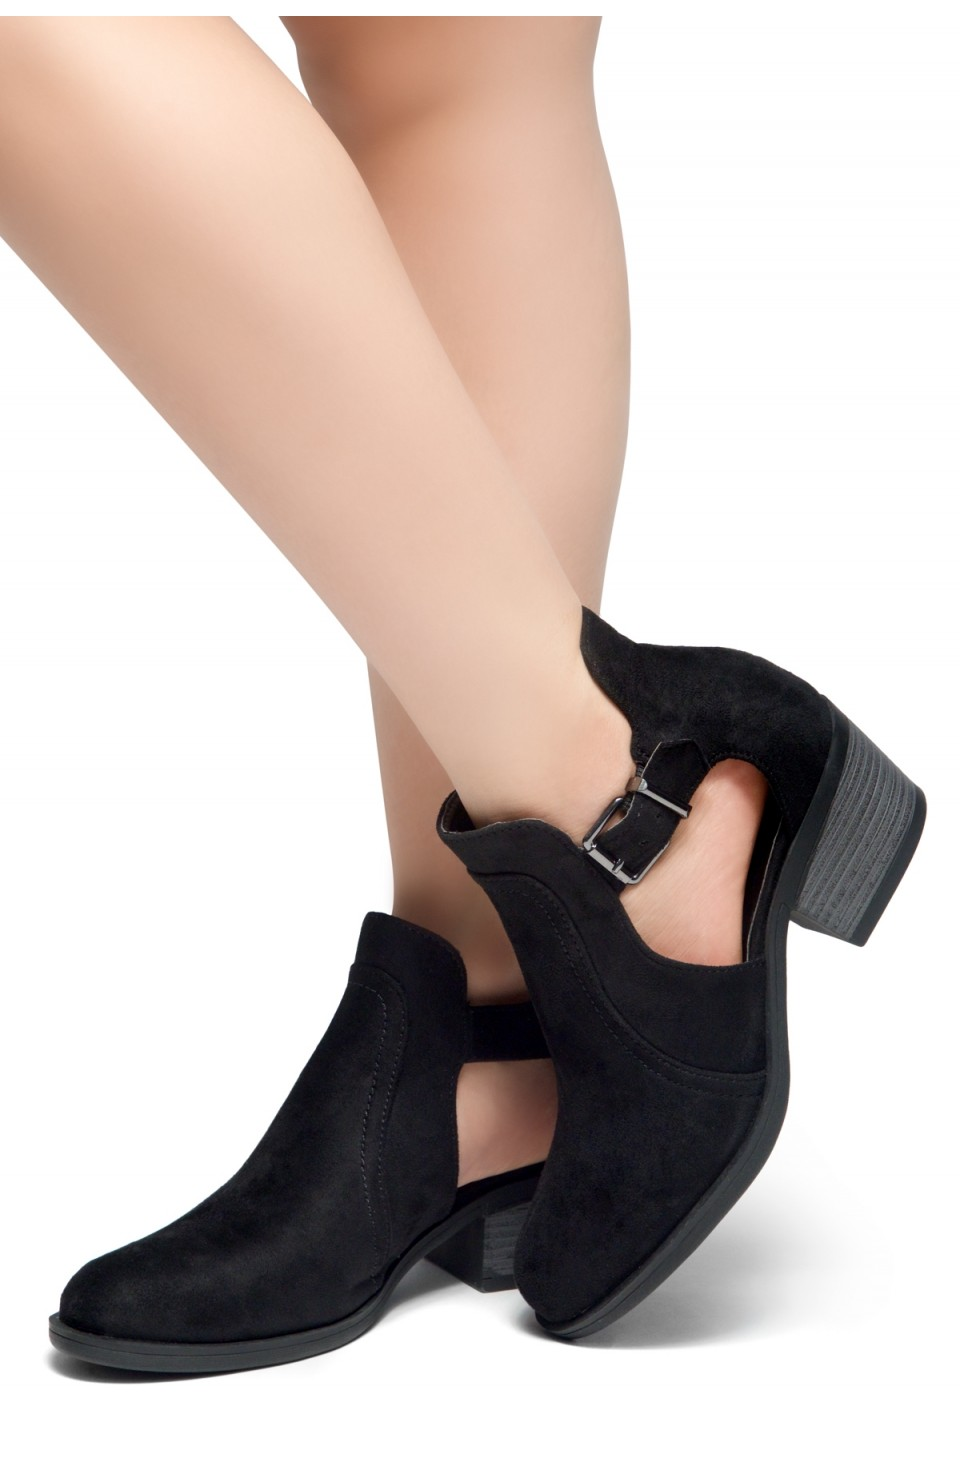 HerStyle Prisila-Stacked Heel Almond Toe Booties (Black)